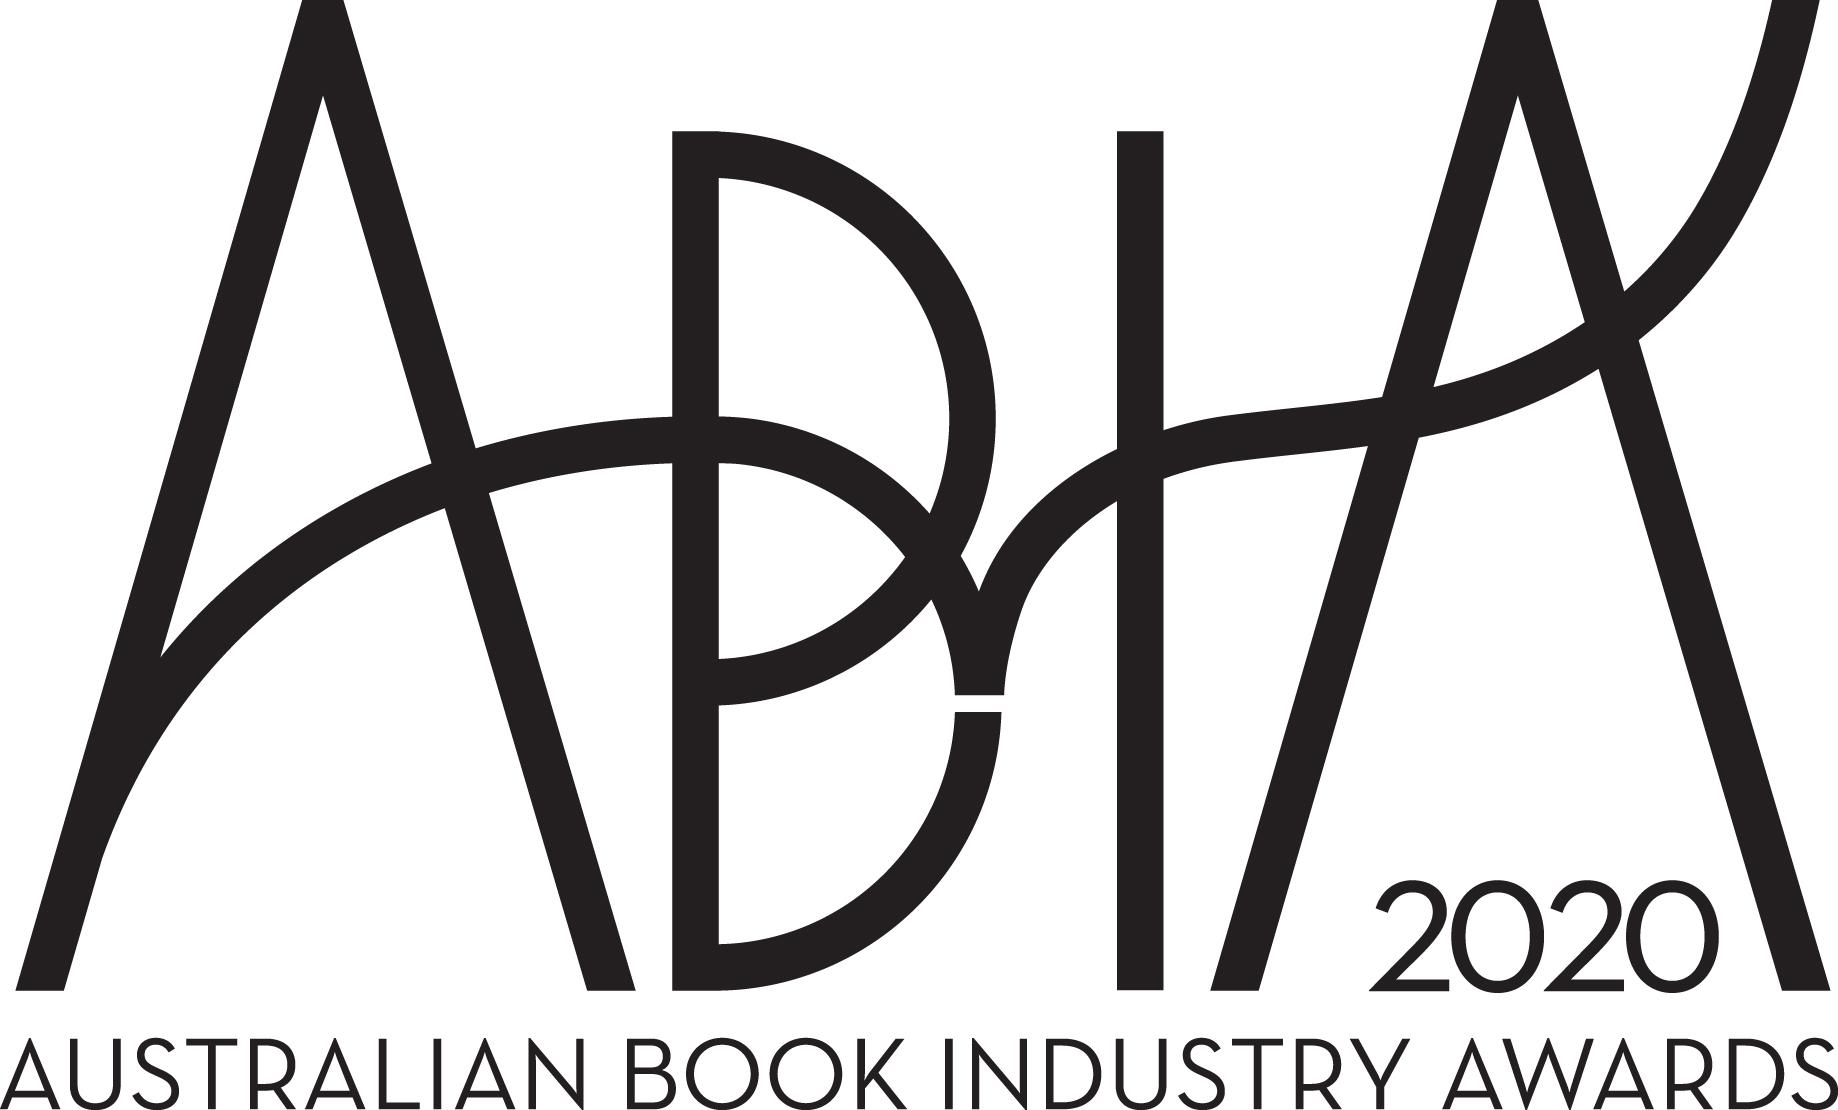 2020 ABIA Award Winners Announced